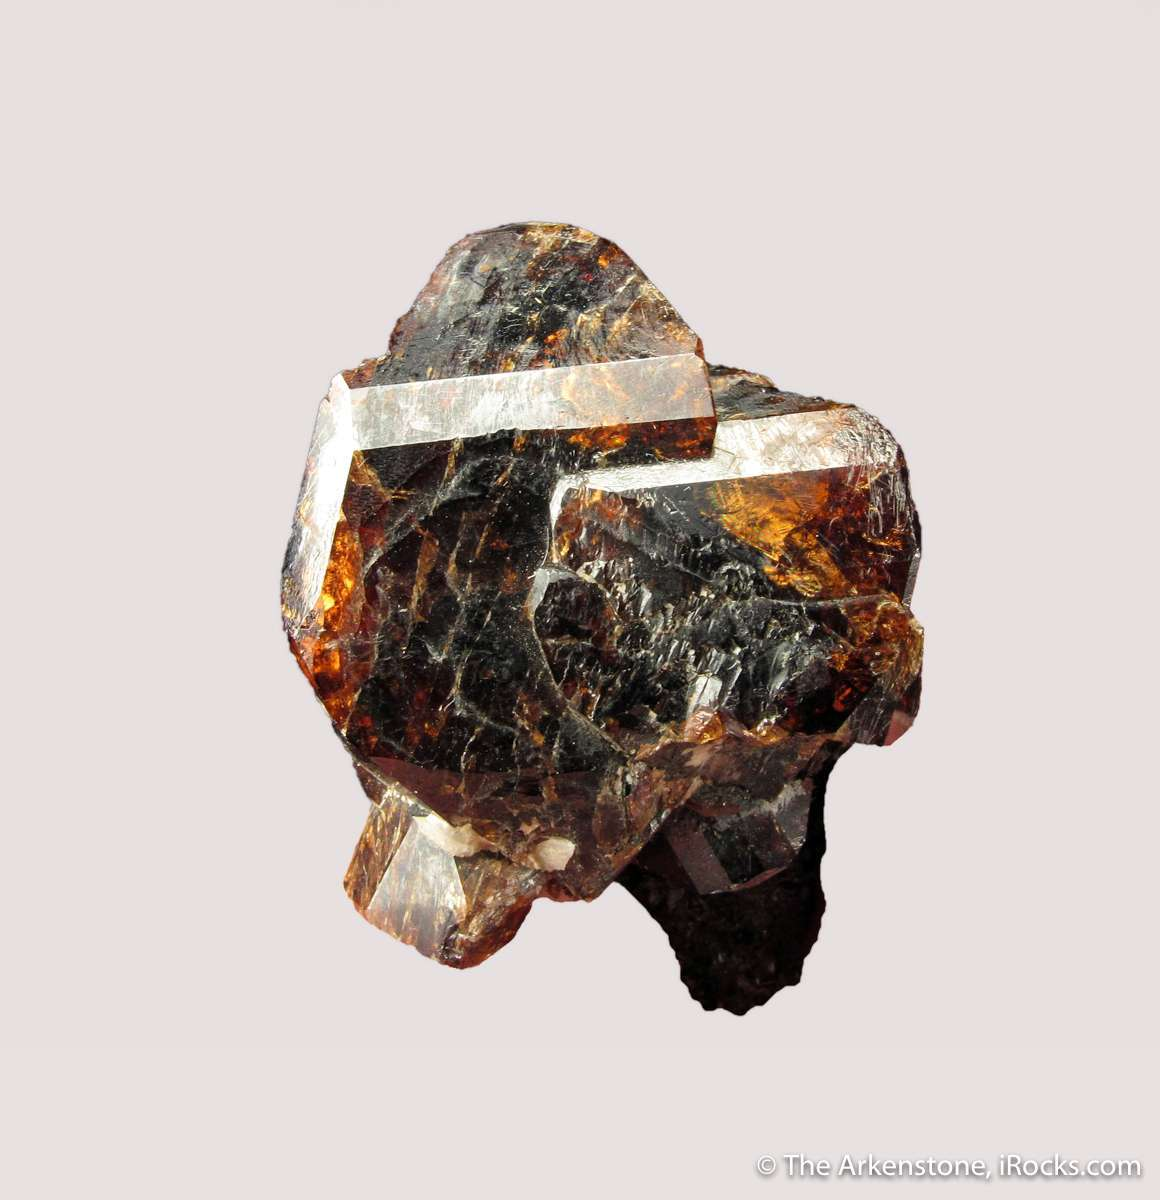 Norway known Zircons type localities old classic specimen upholds